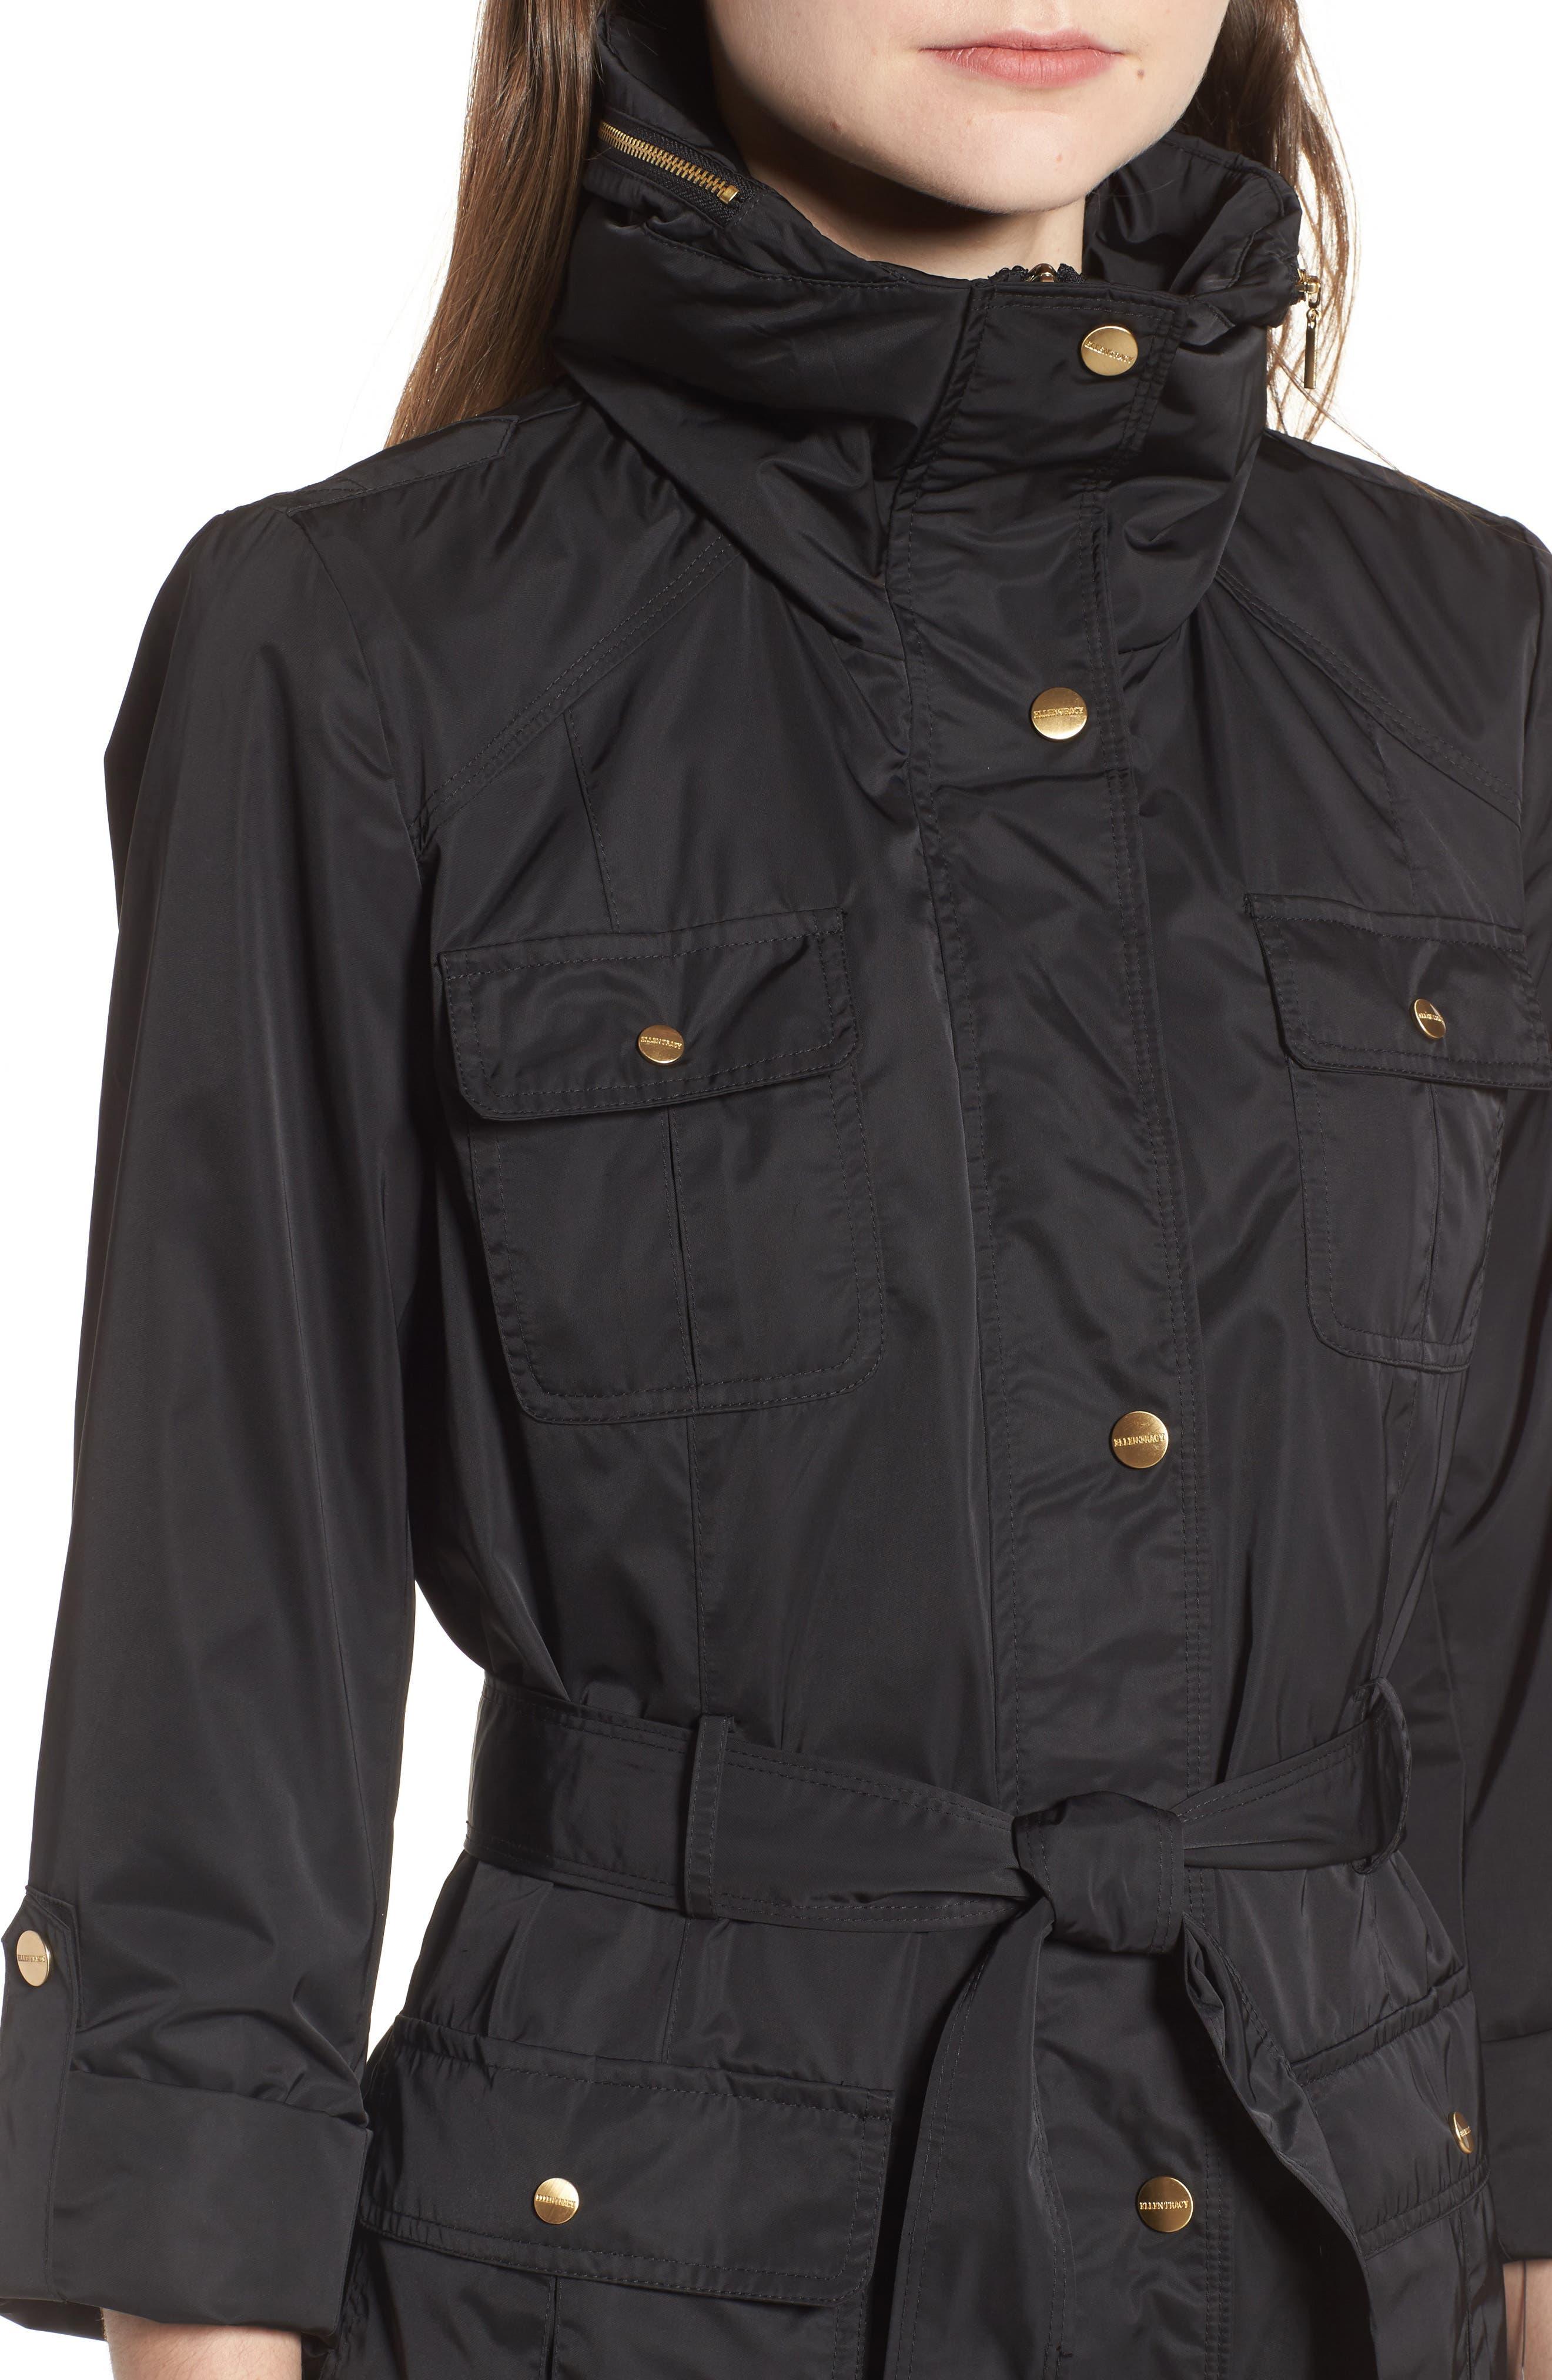 Techno Short Trench Coat,                             Alternate thumbnail 4, color,                             001